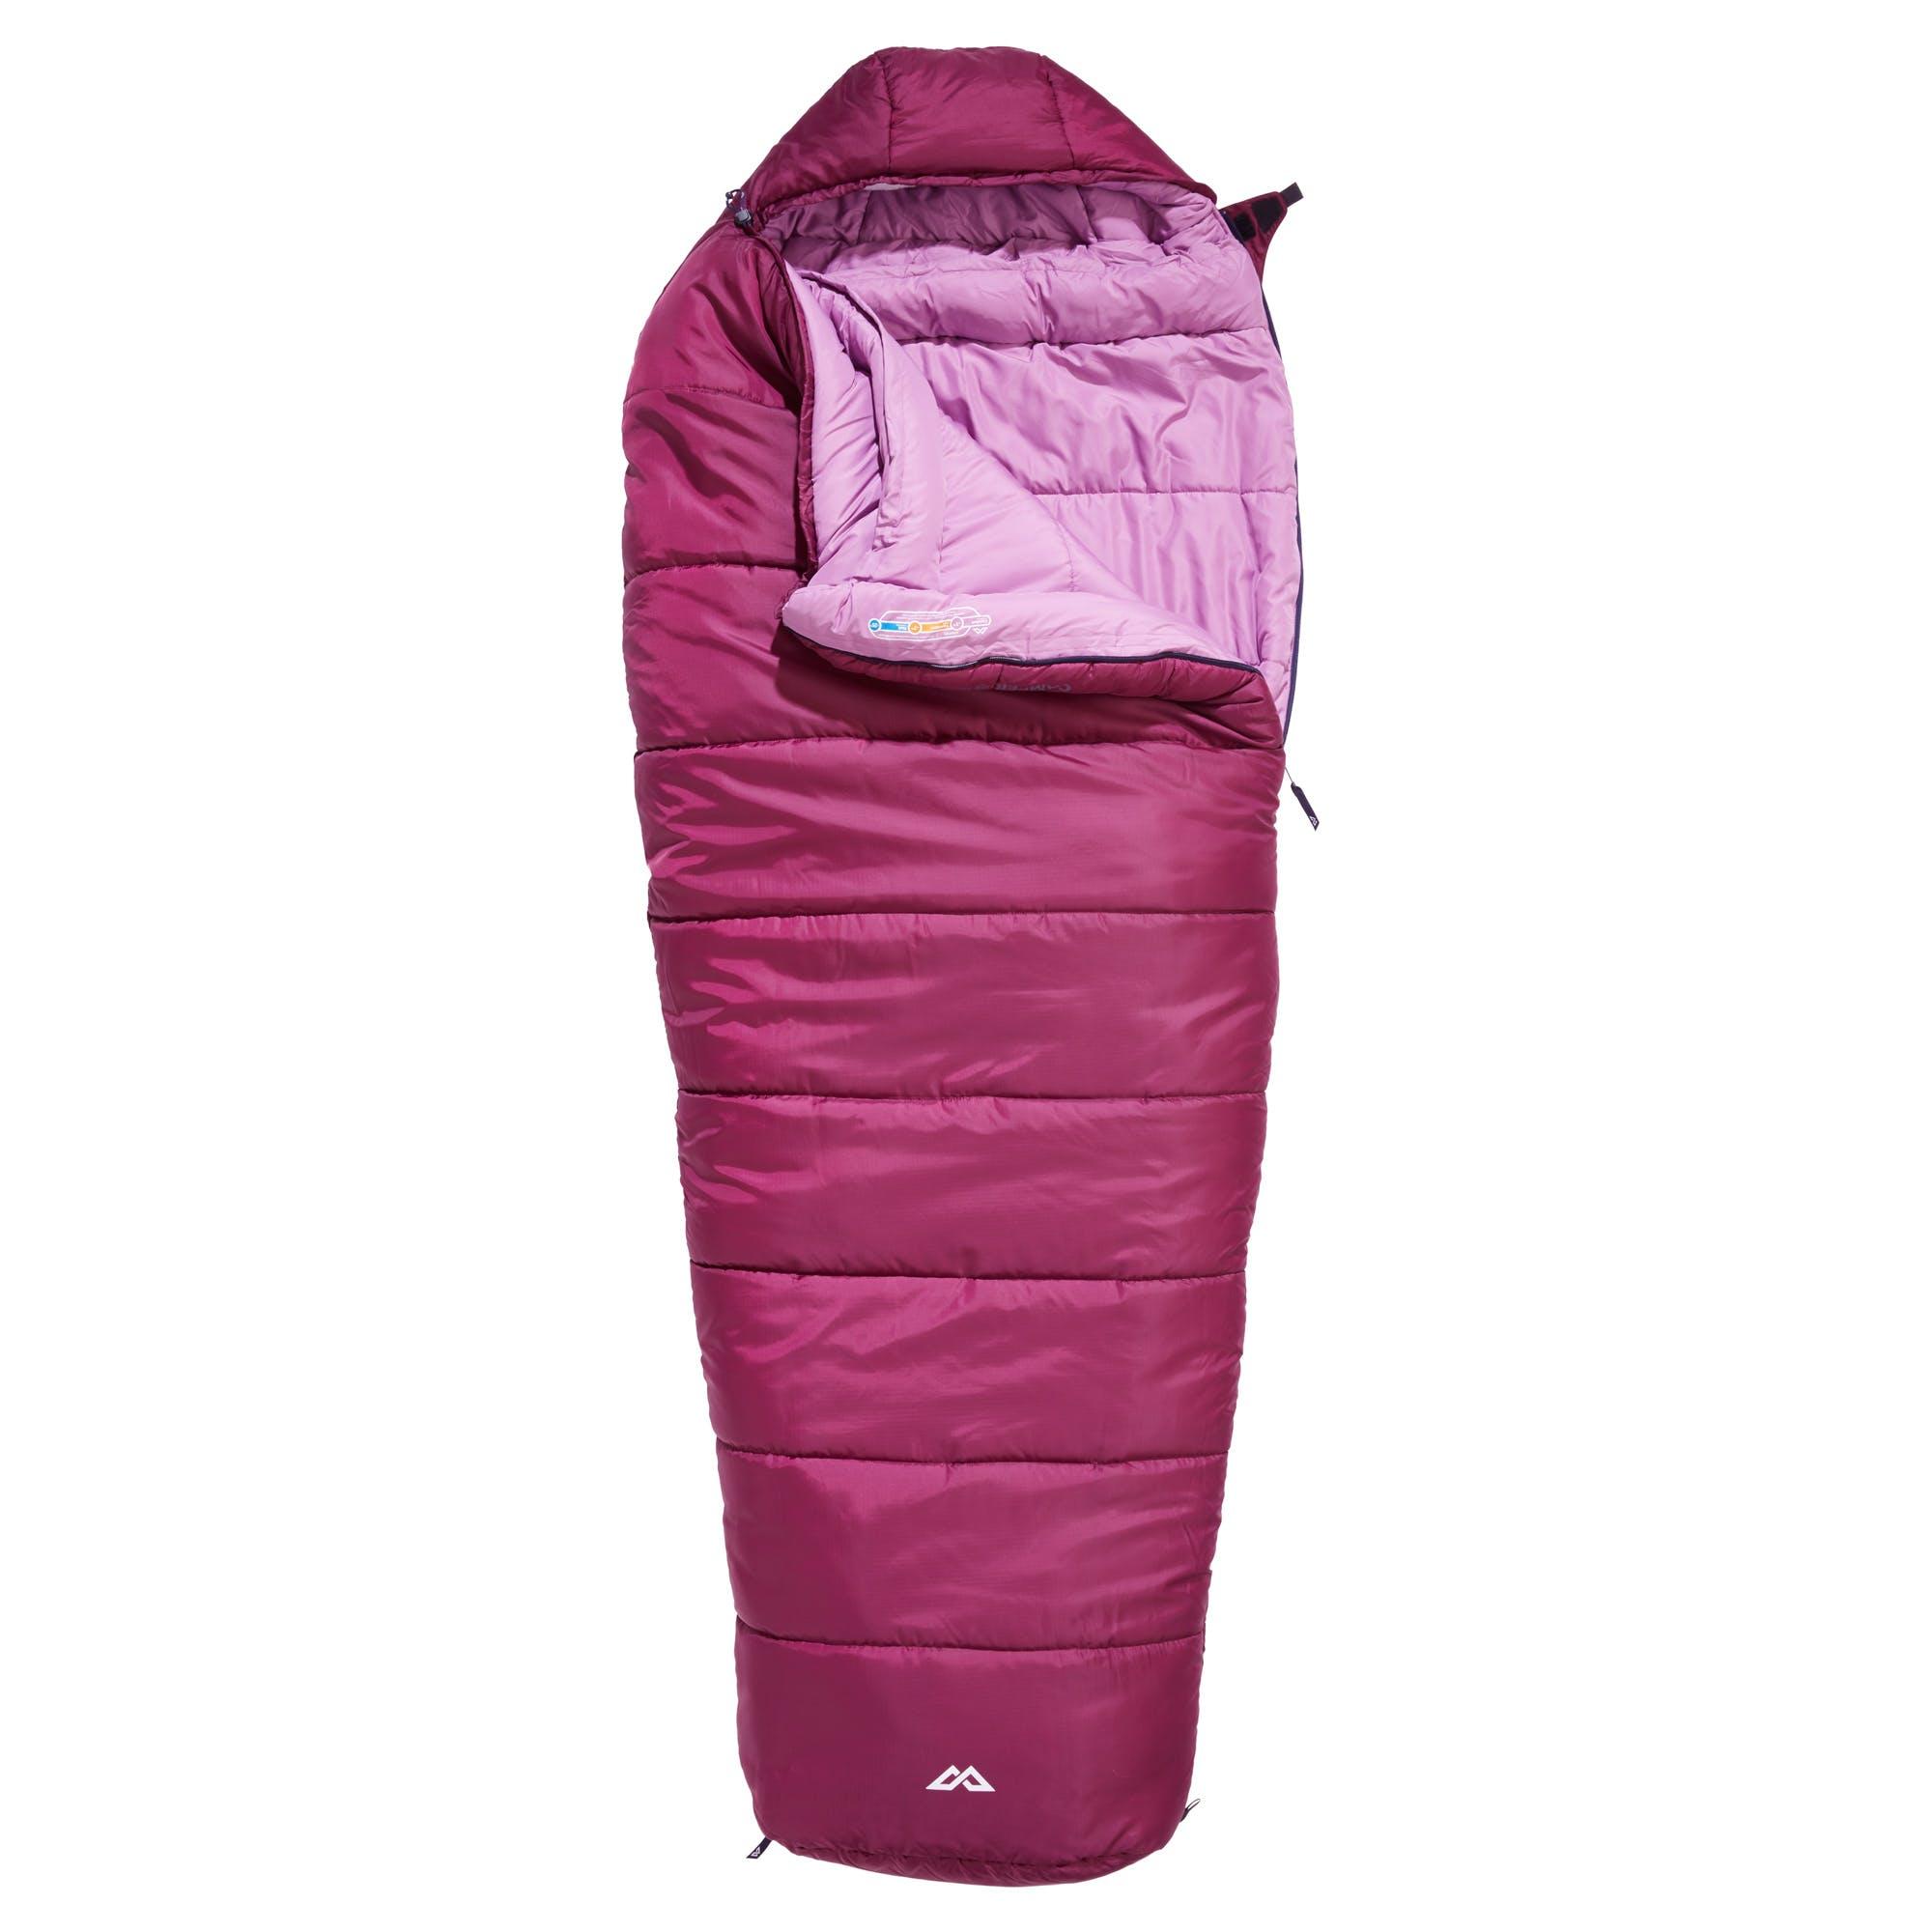 Kathmandu sleeping bag pink